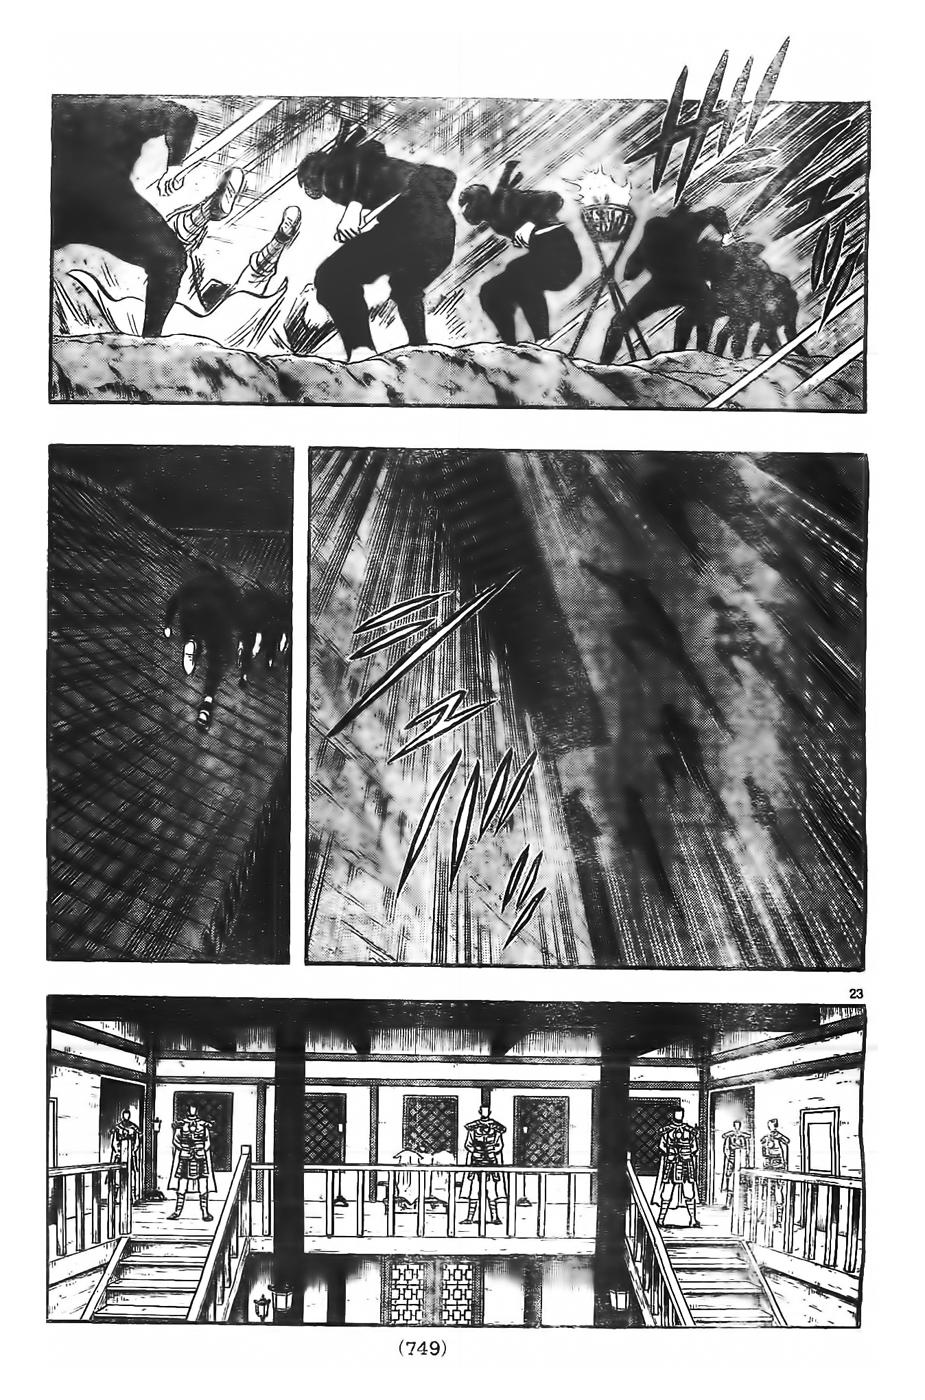 Hoàng Phi Hồng Phần 4 chap 80 Trang 23